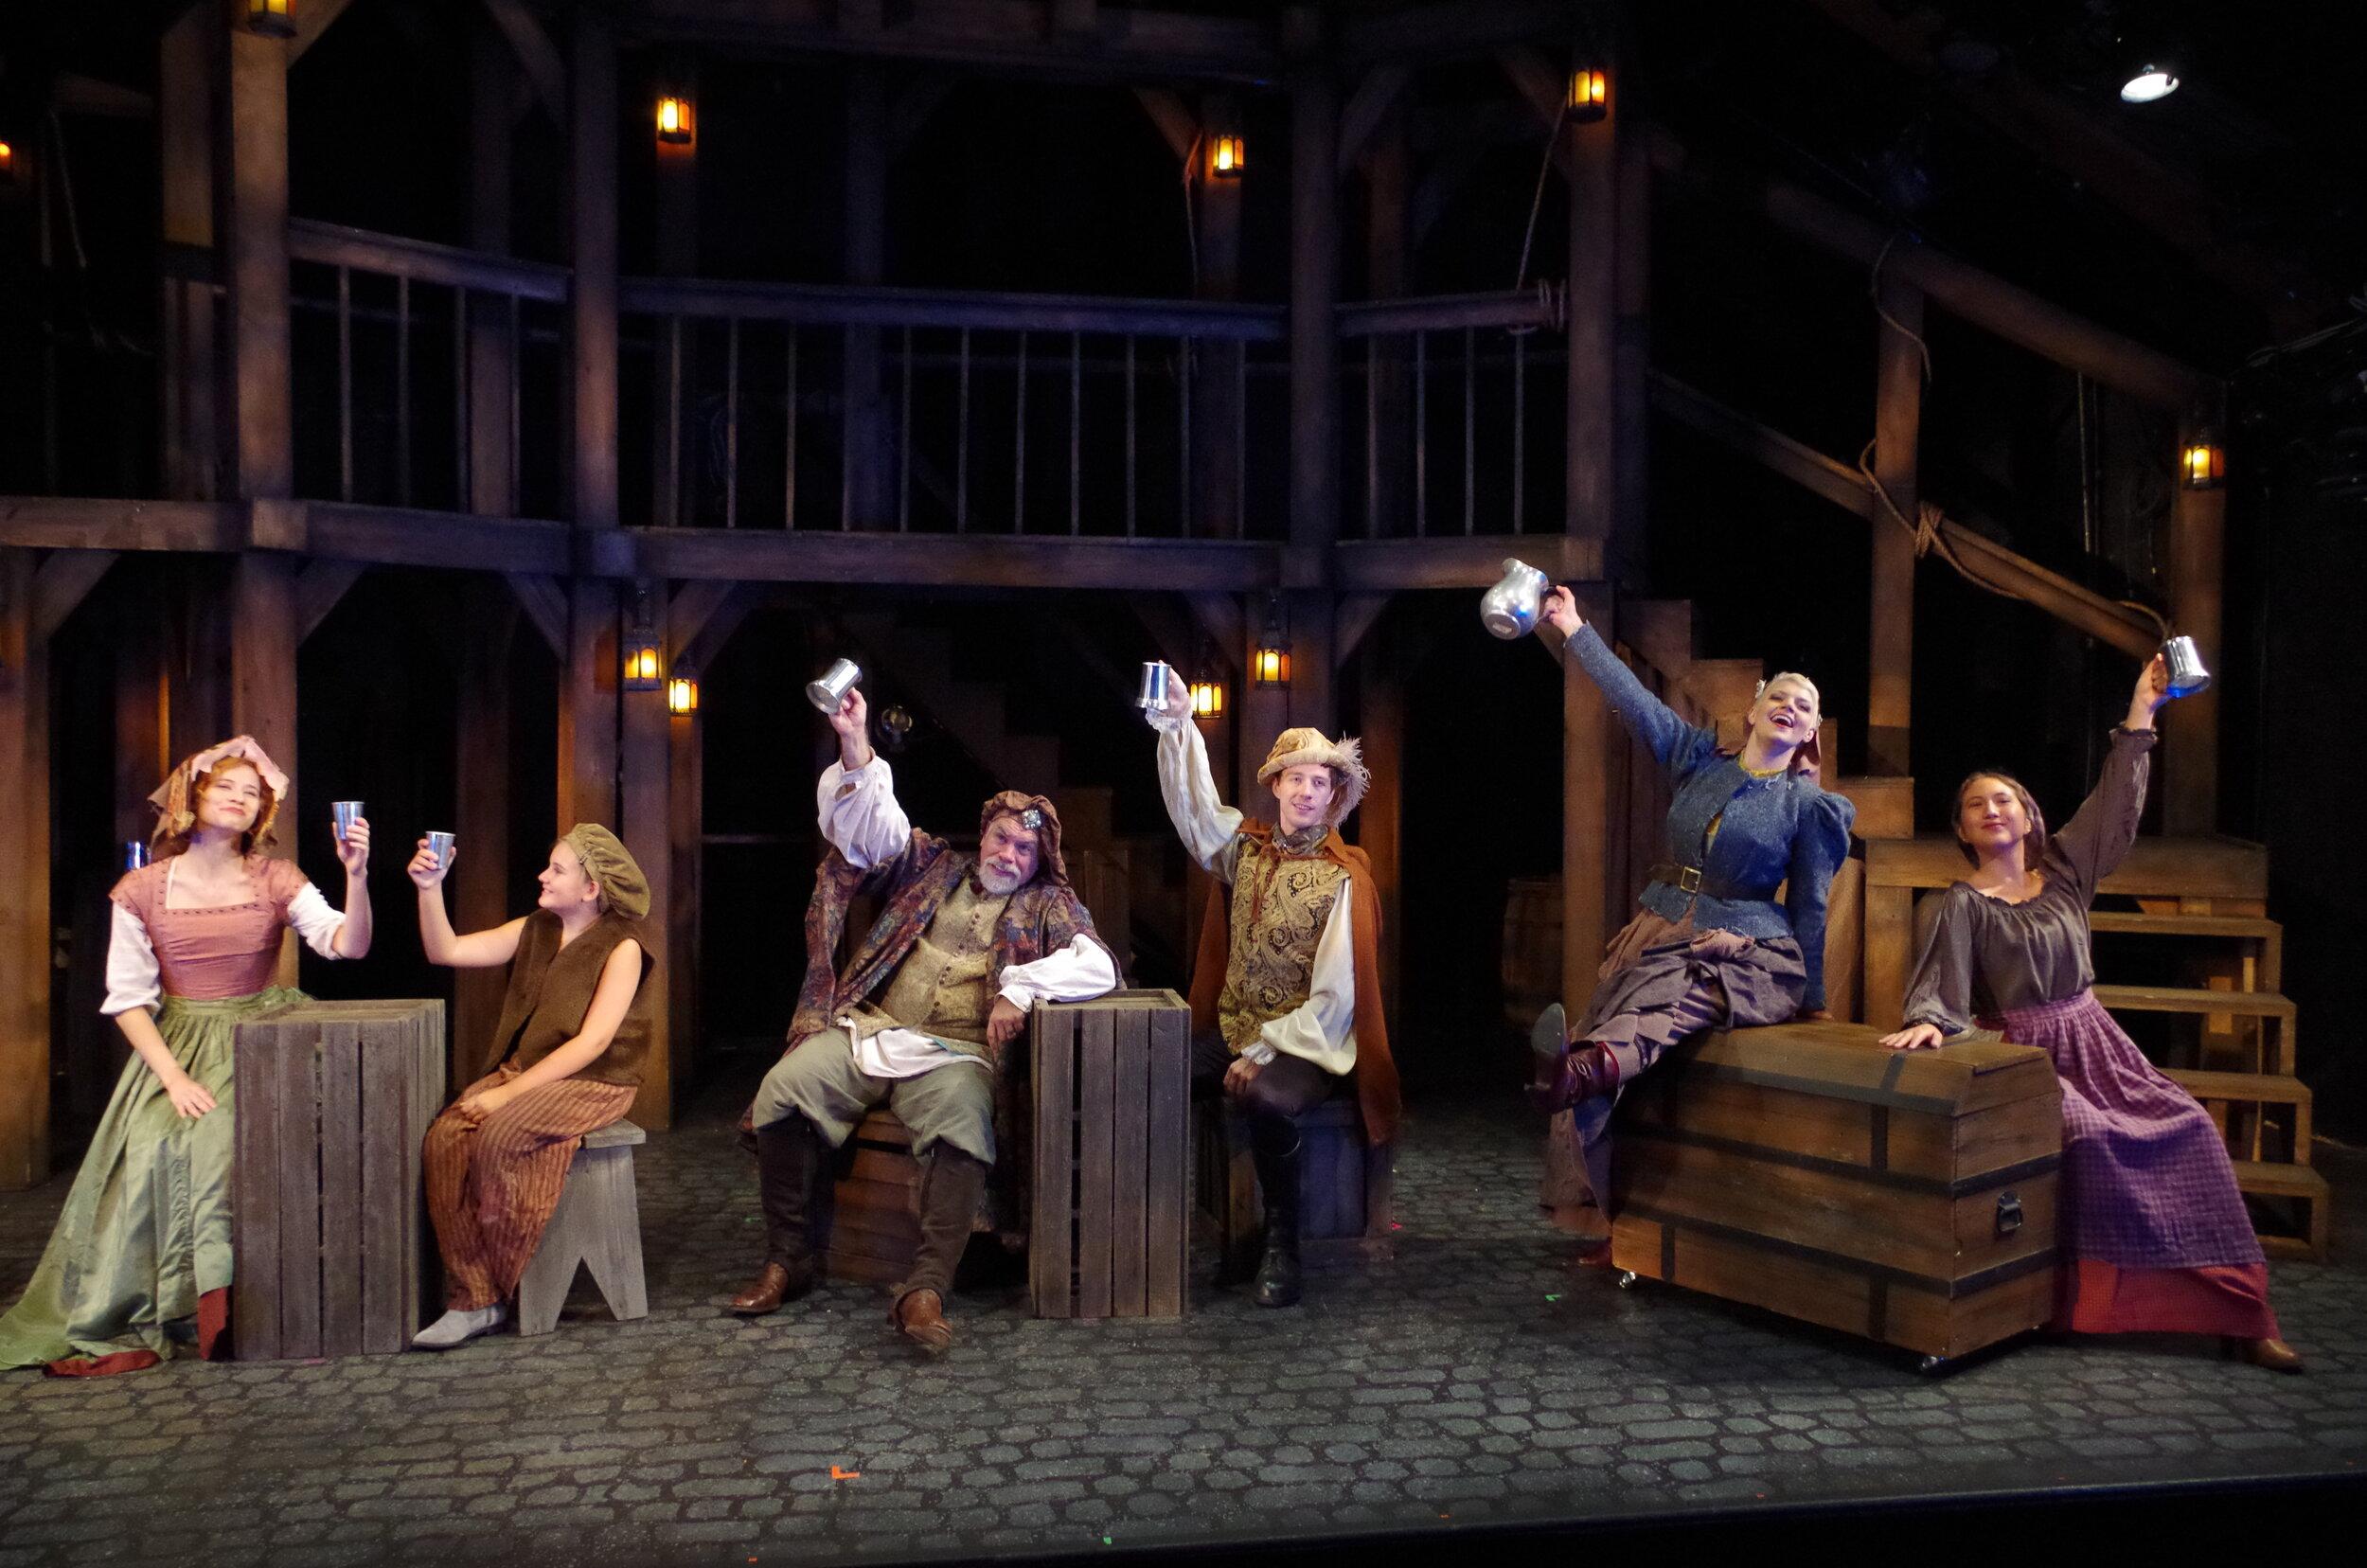 Hannah Karpenko, Bunny Baldwin, Mark Poppleton, Michael Radi, Leigh Martha Klinger, and Alex Loucks in  The King's Legacy  at Bristol Valley Theater (Photo by Rich Miller)